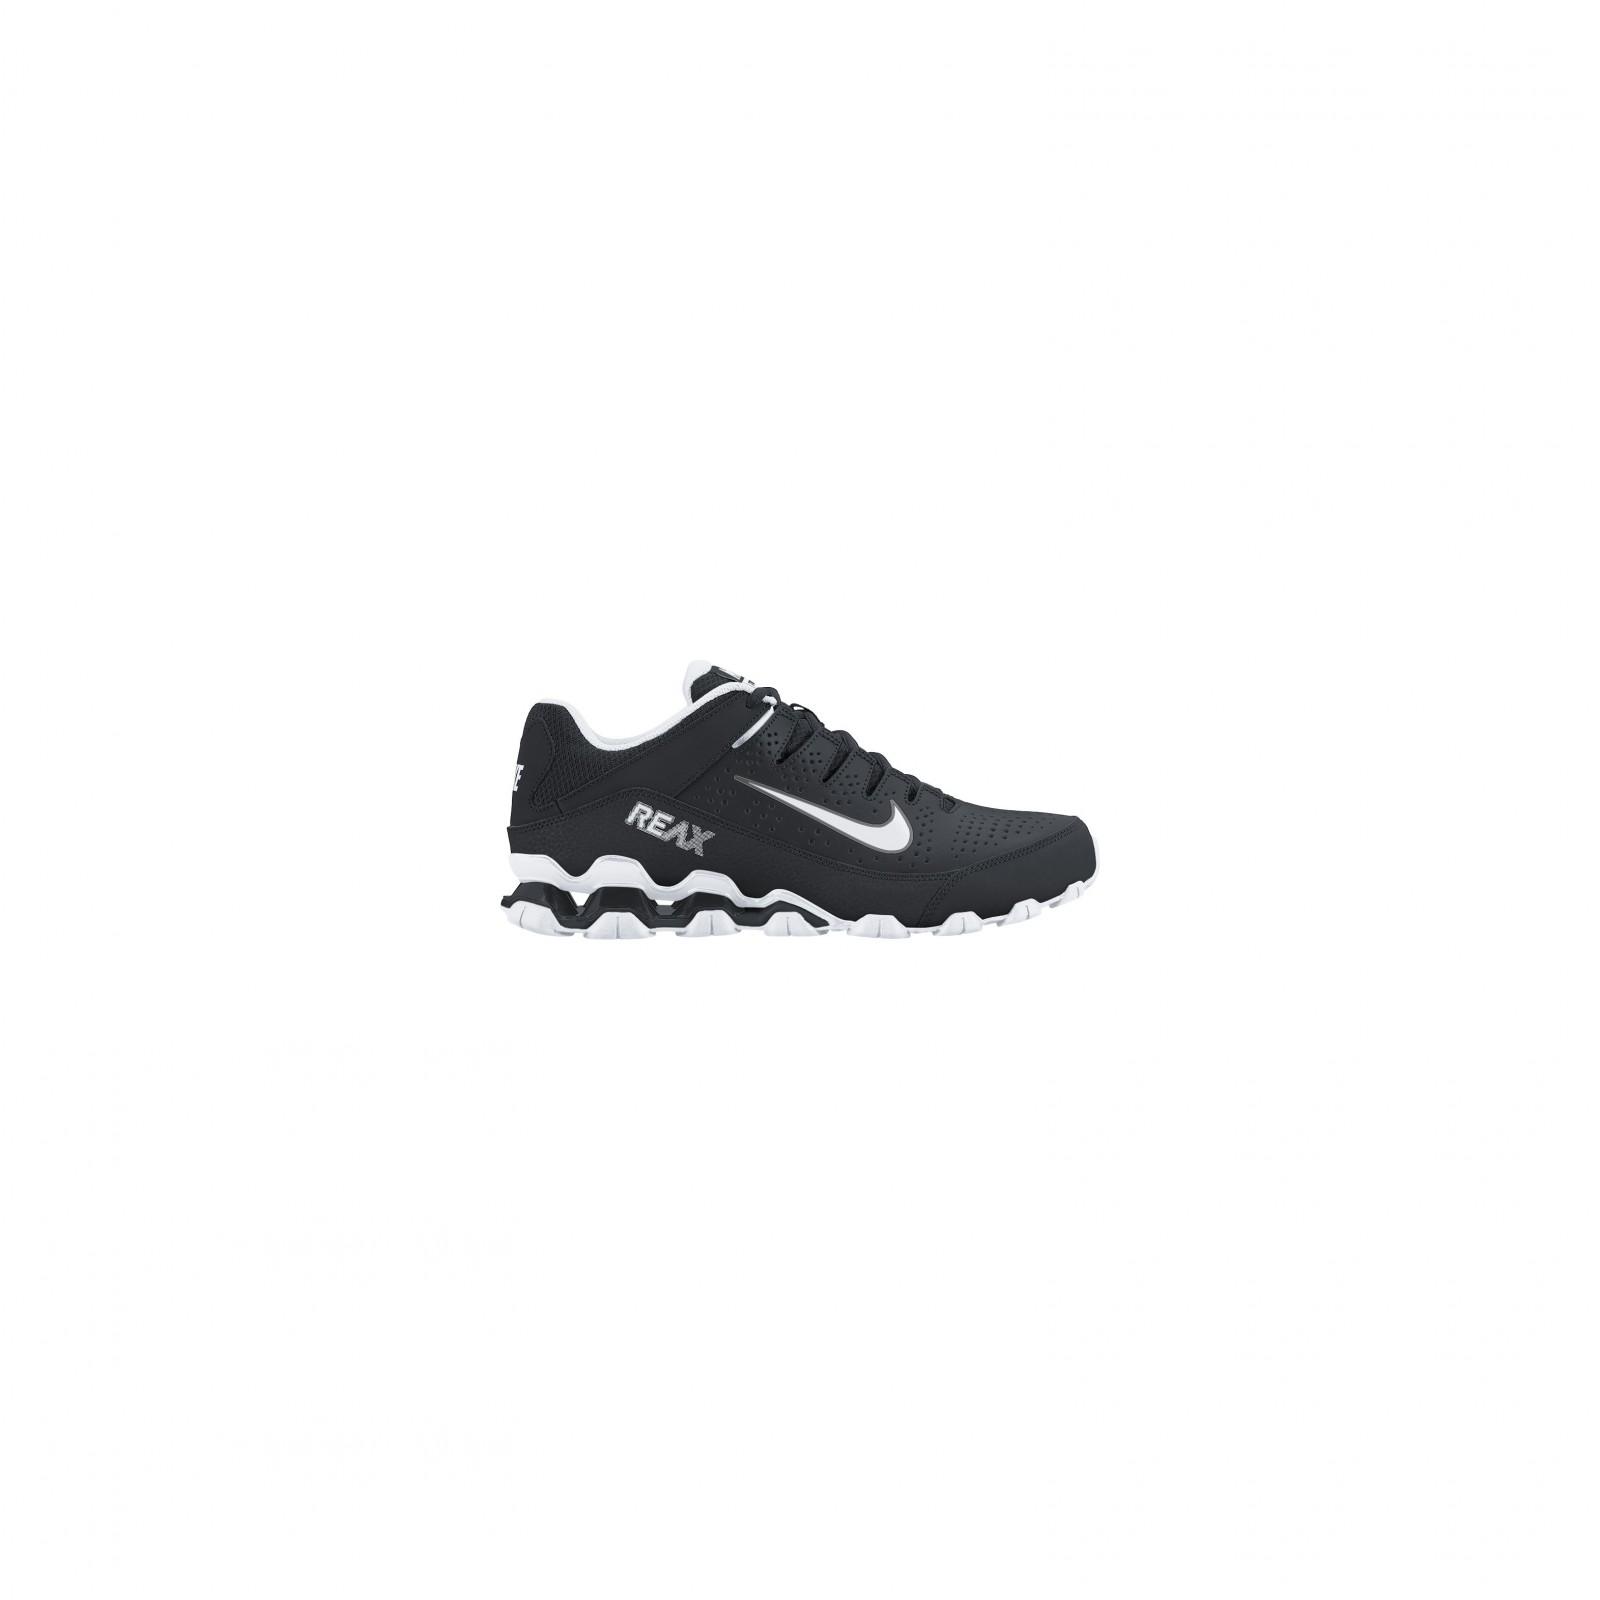 34f4ad2d61c Pánské fitness boty Nike REAX 8 TR